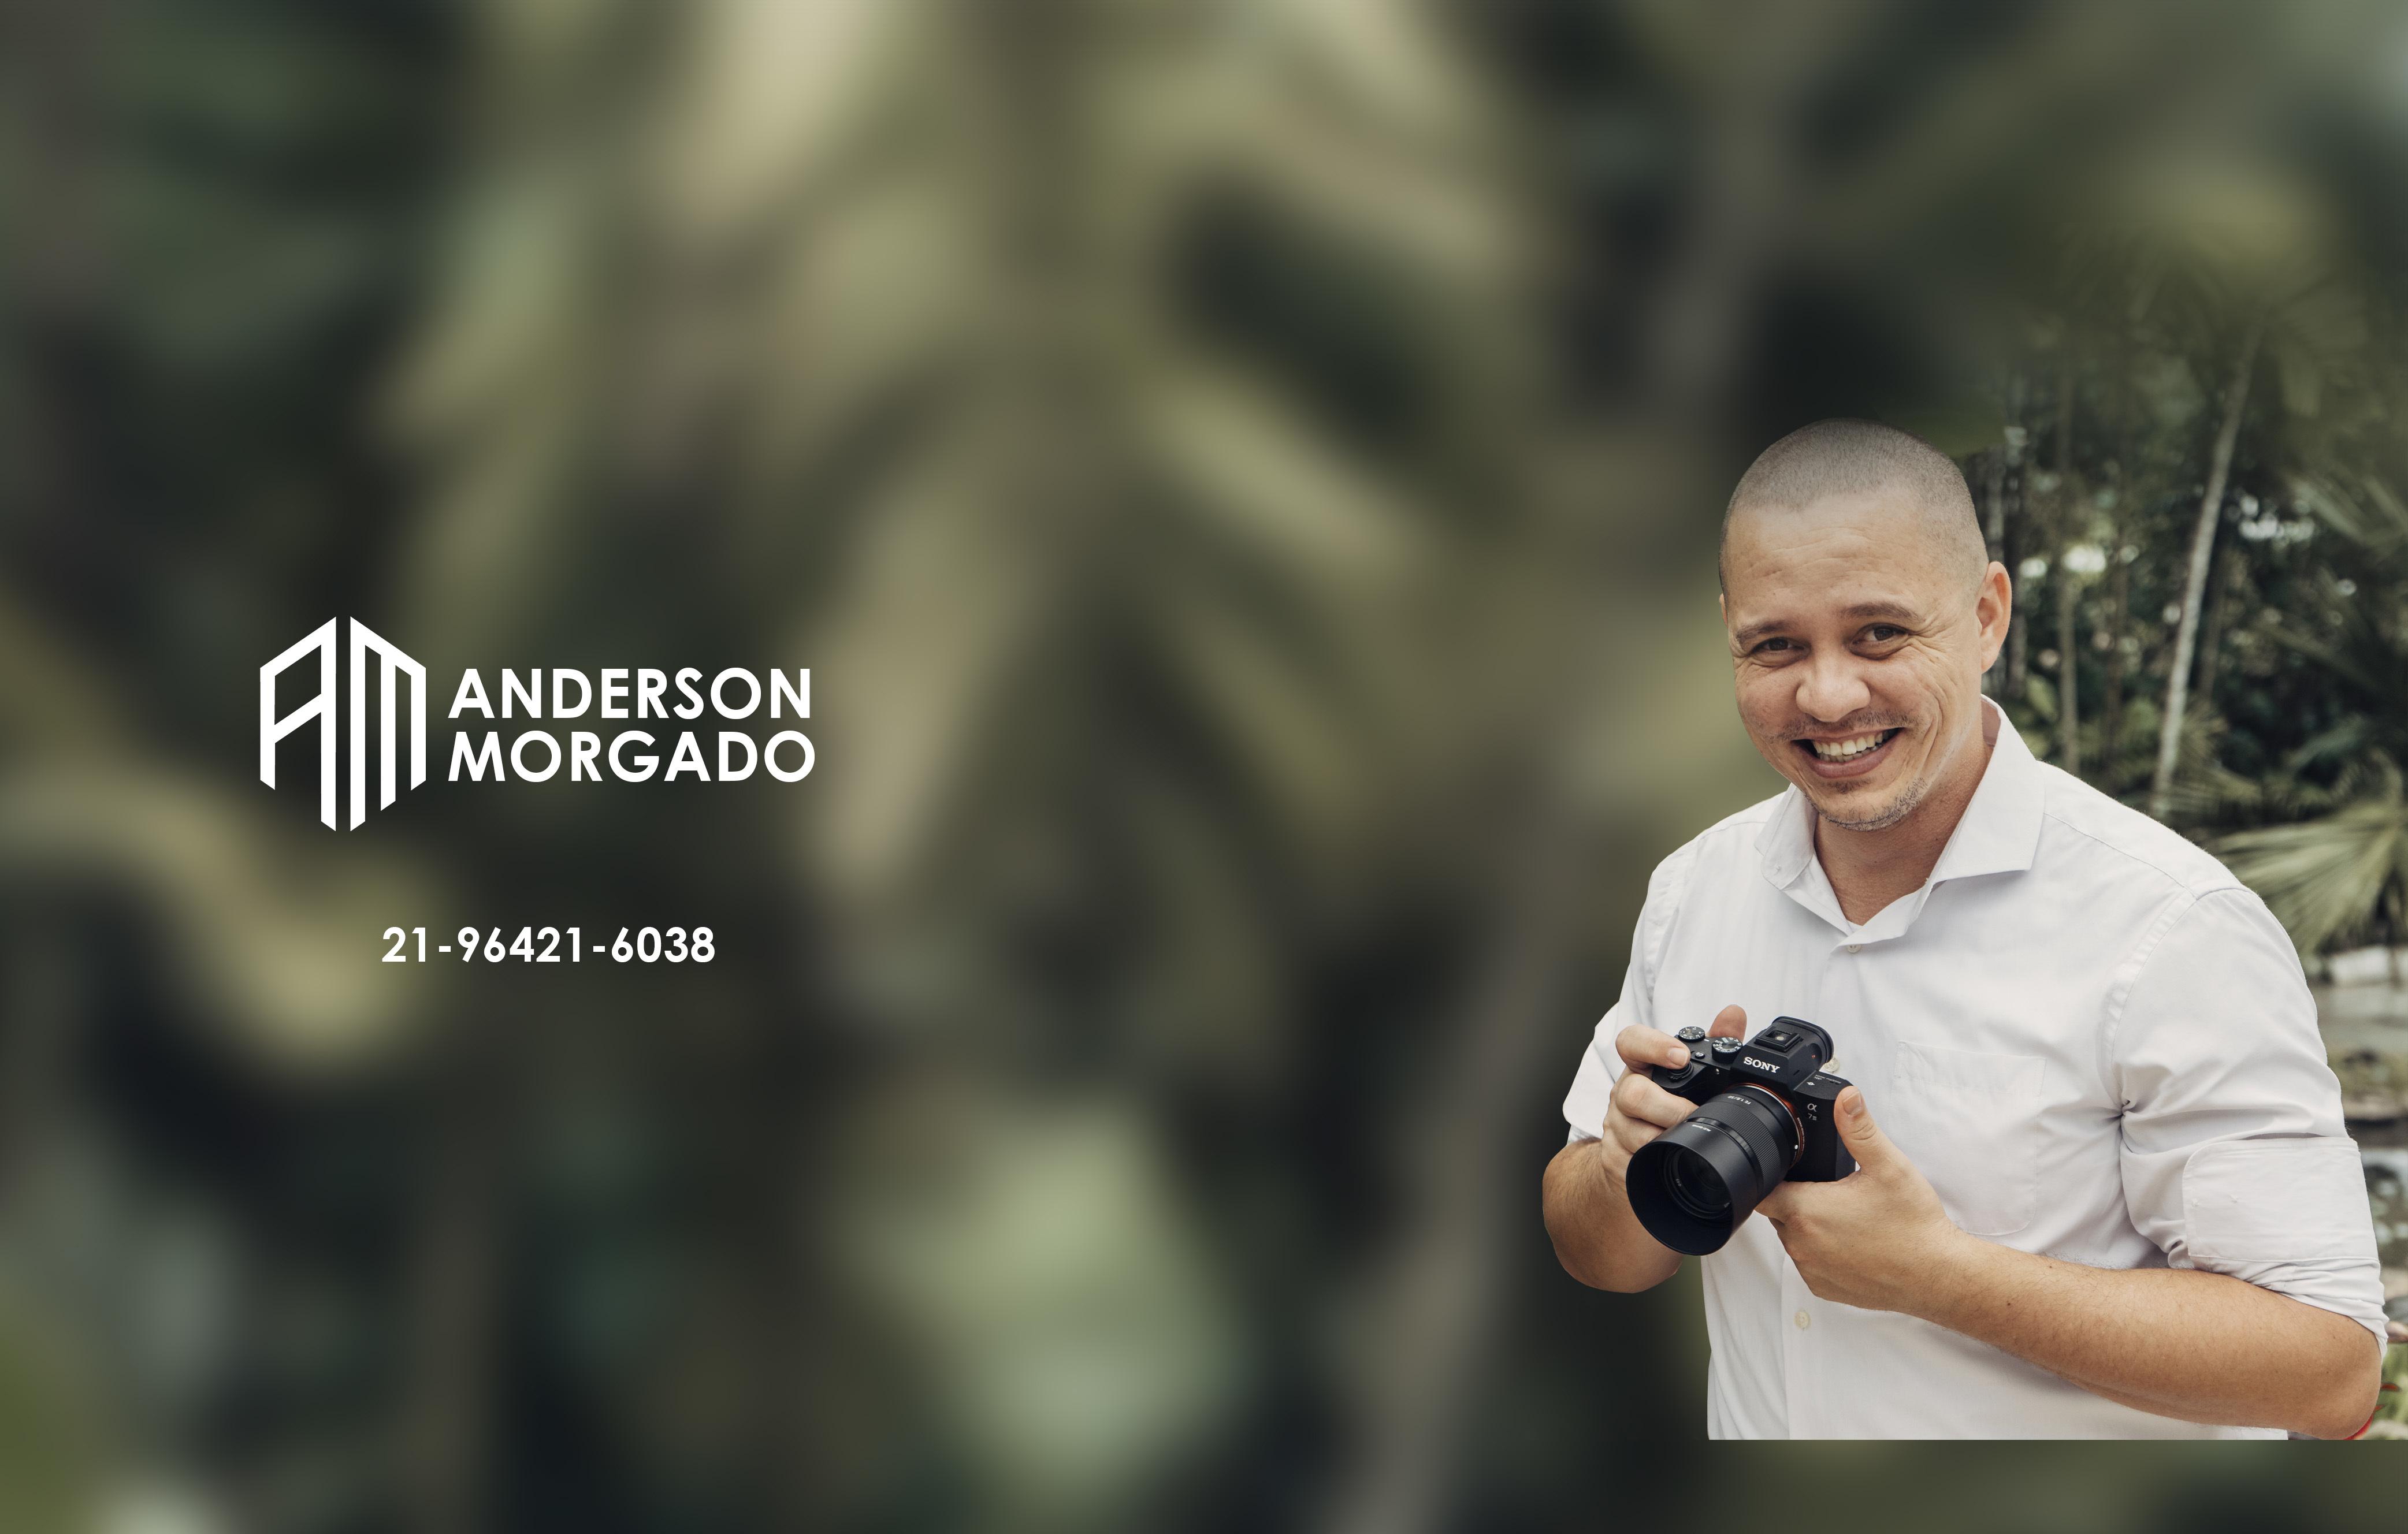 Sobre Anderson Morgado - Fotografia & Filme